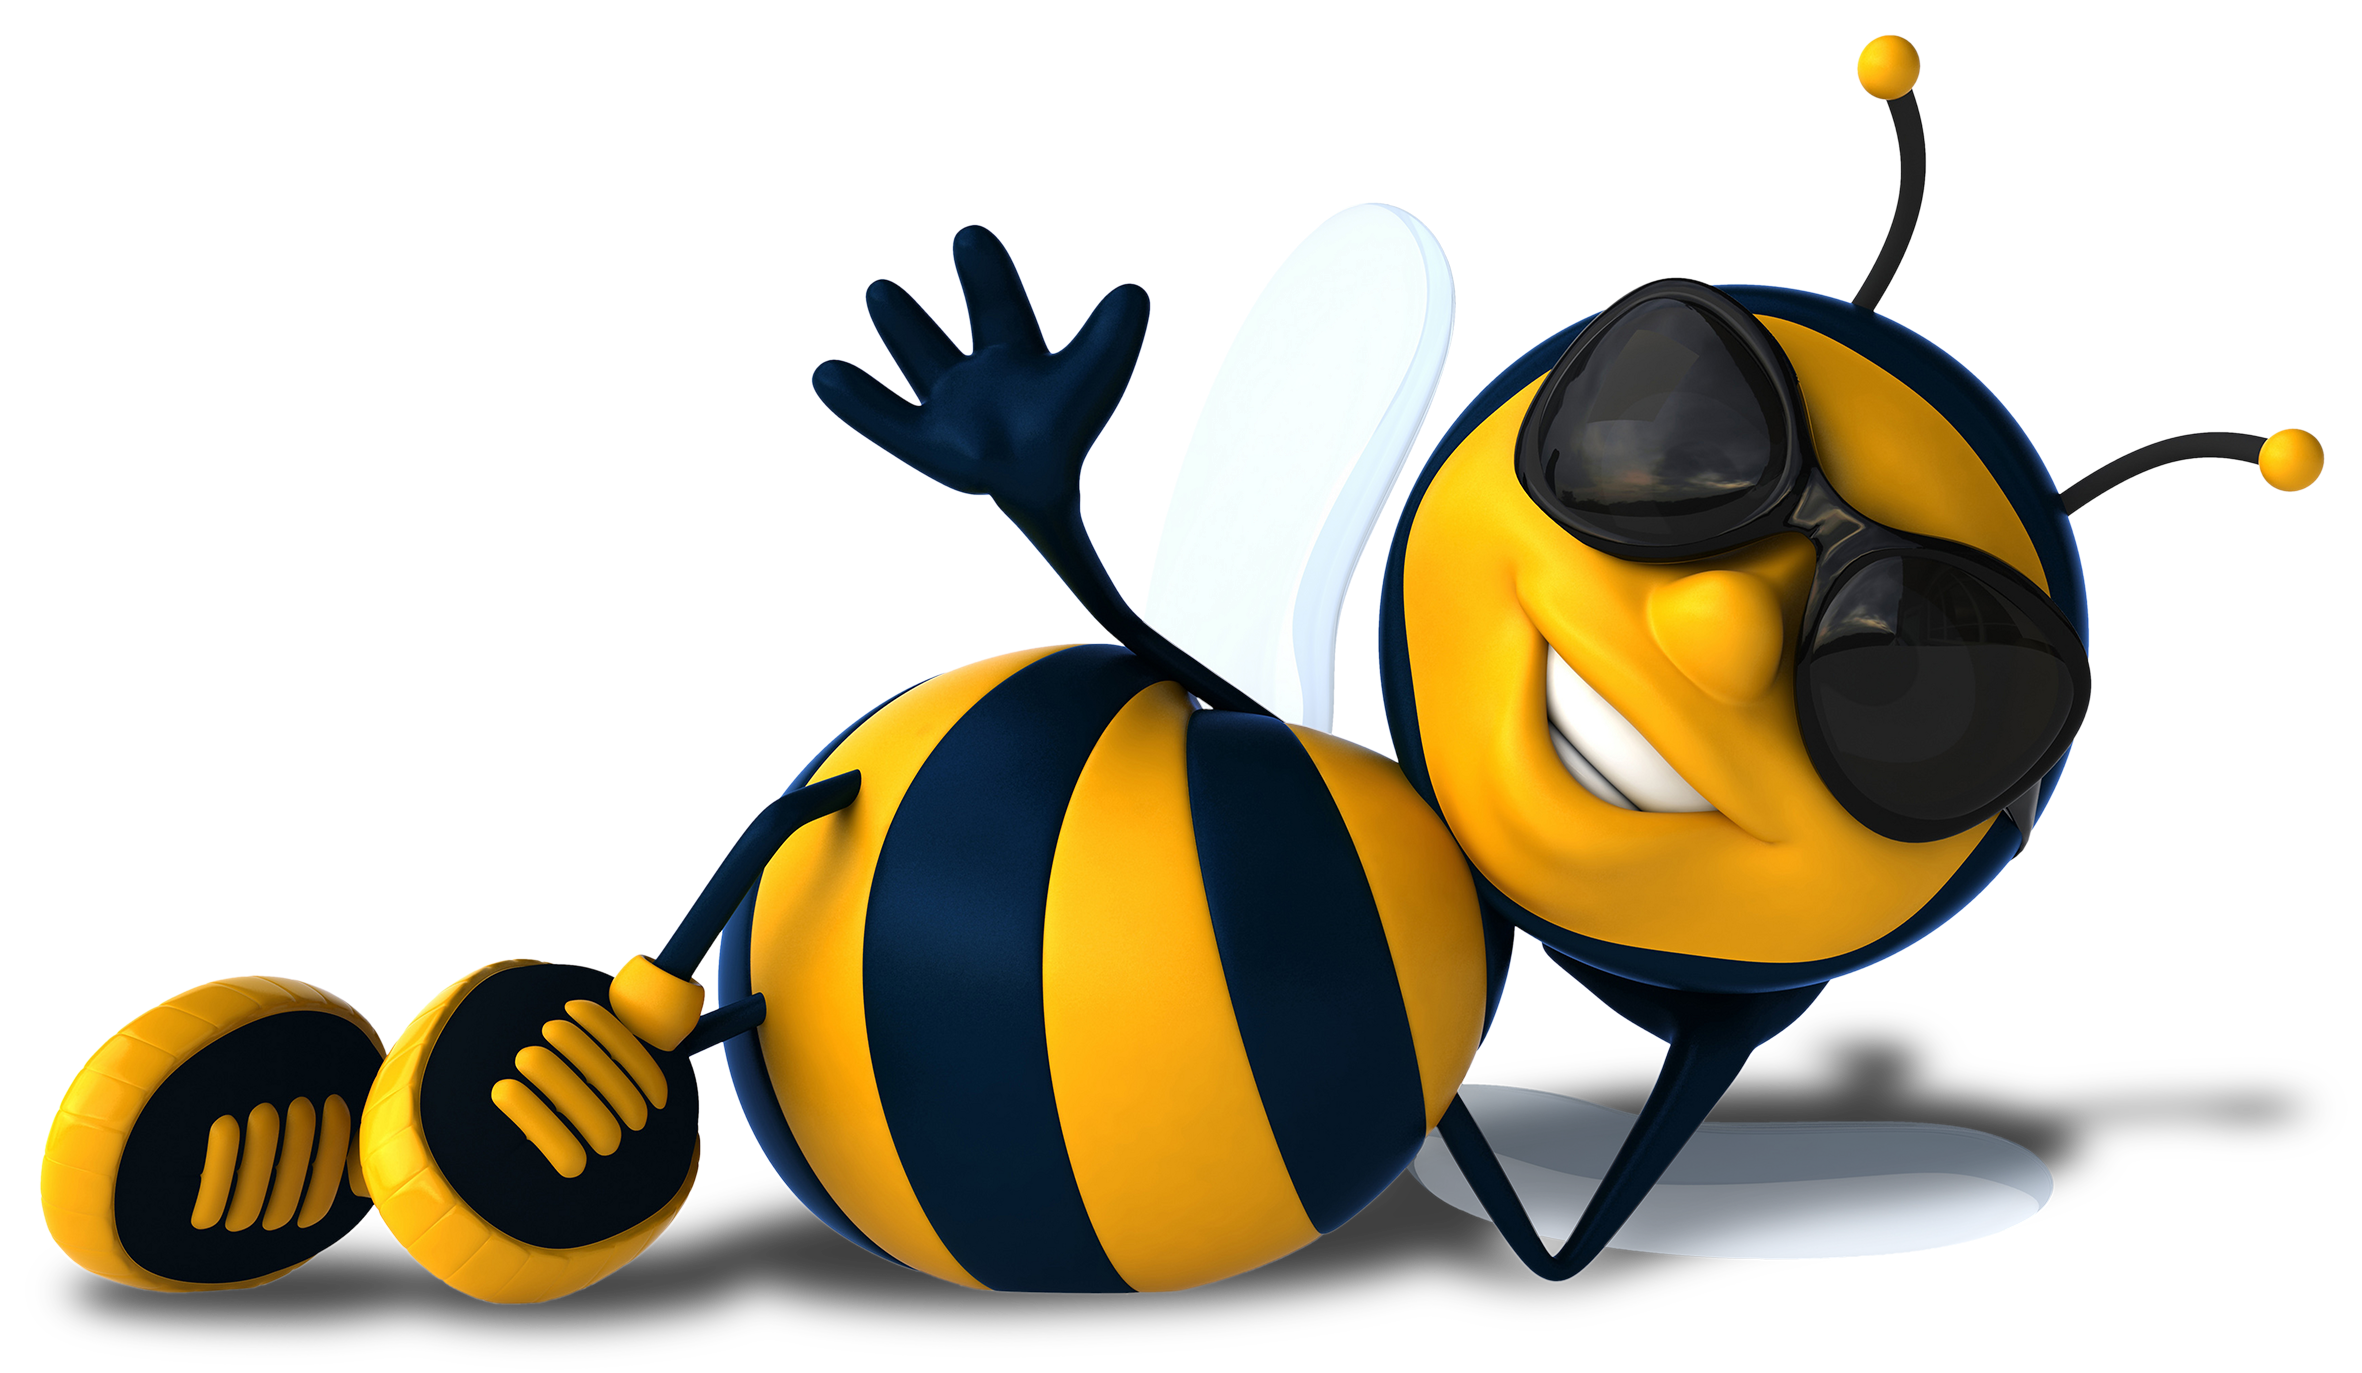 Pin By Sfunke On Queen Bee Bee Buy Bees Bee Free